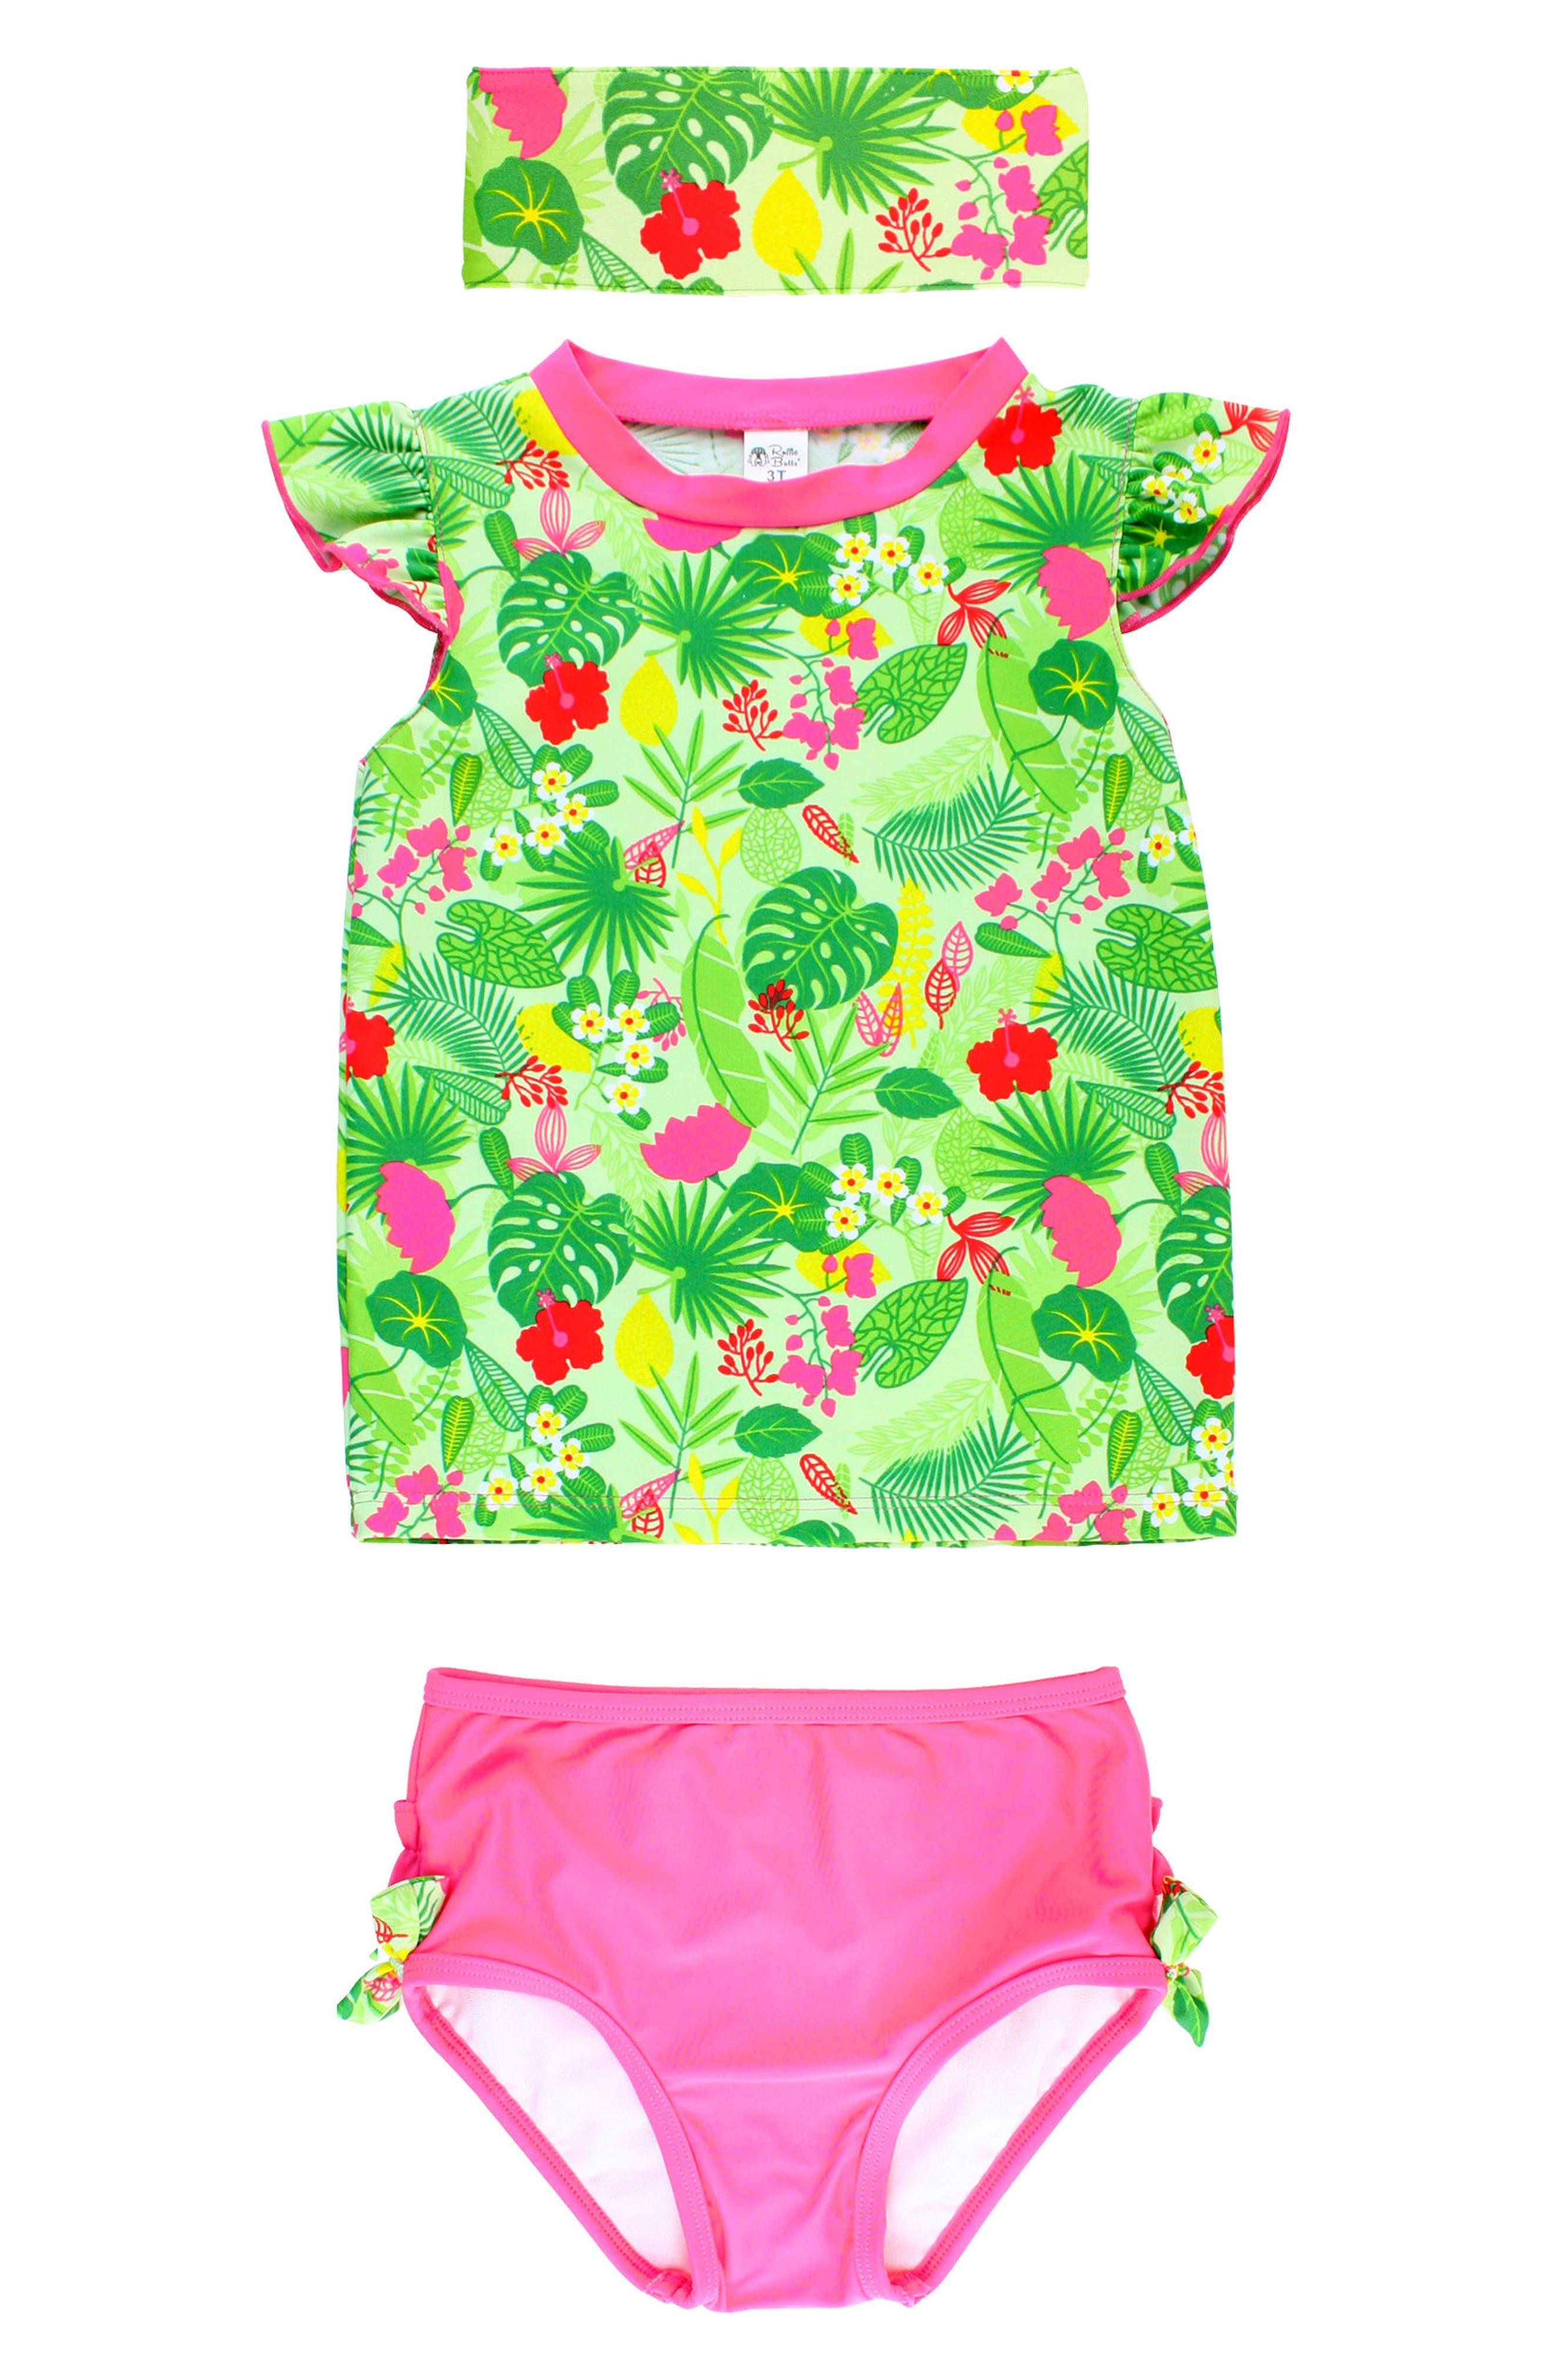 Tropical Two-Piece Rashguard Swimsuit & Headband Set,                             Main thumbnail 1, color,                             Green